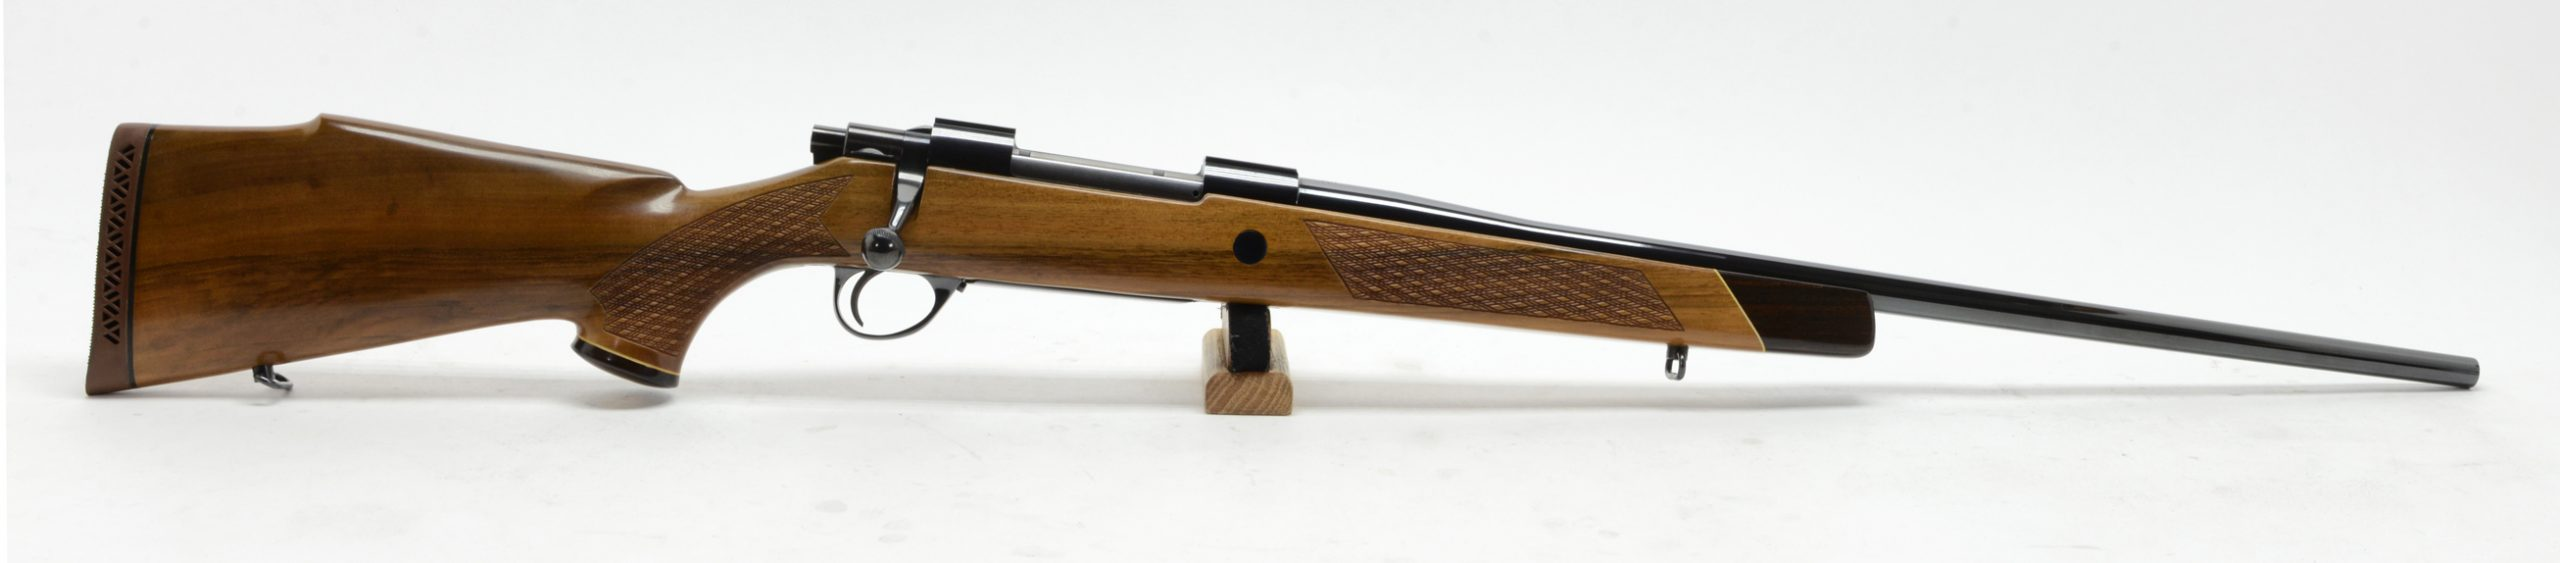 Sako L61R Finnbear Deluxe 270